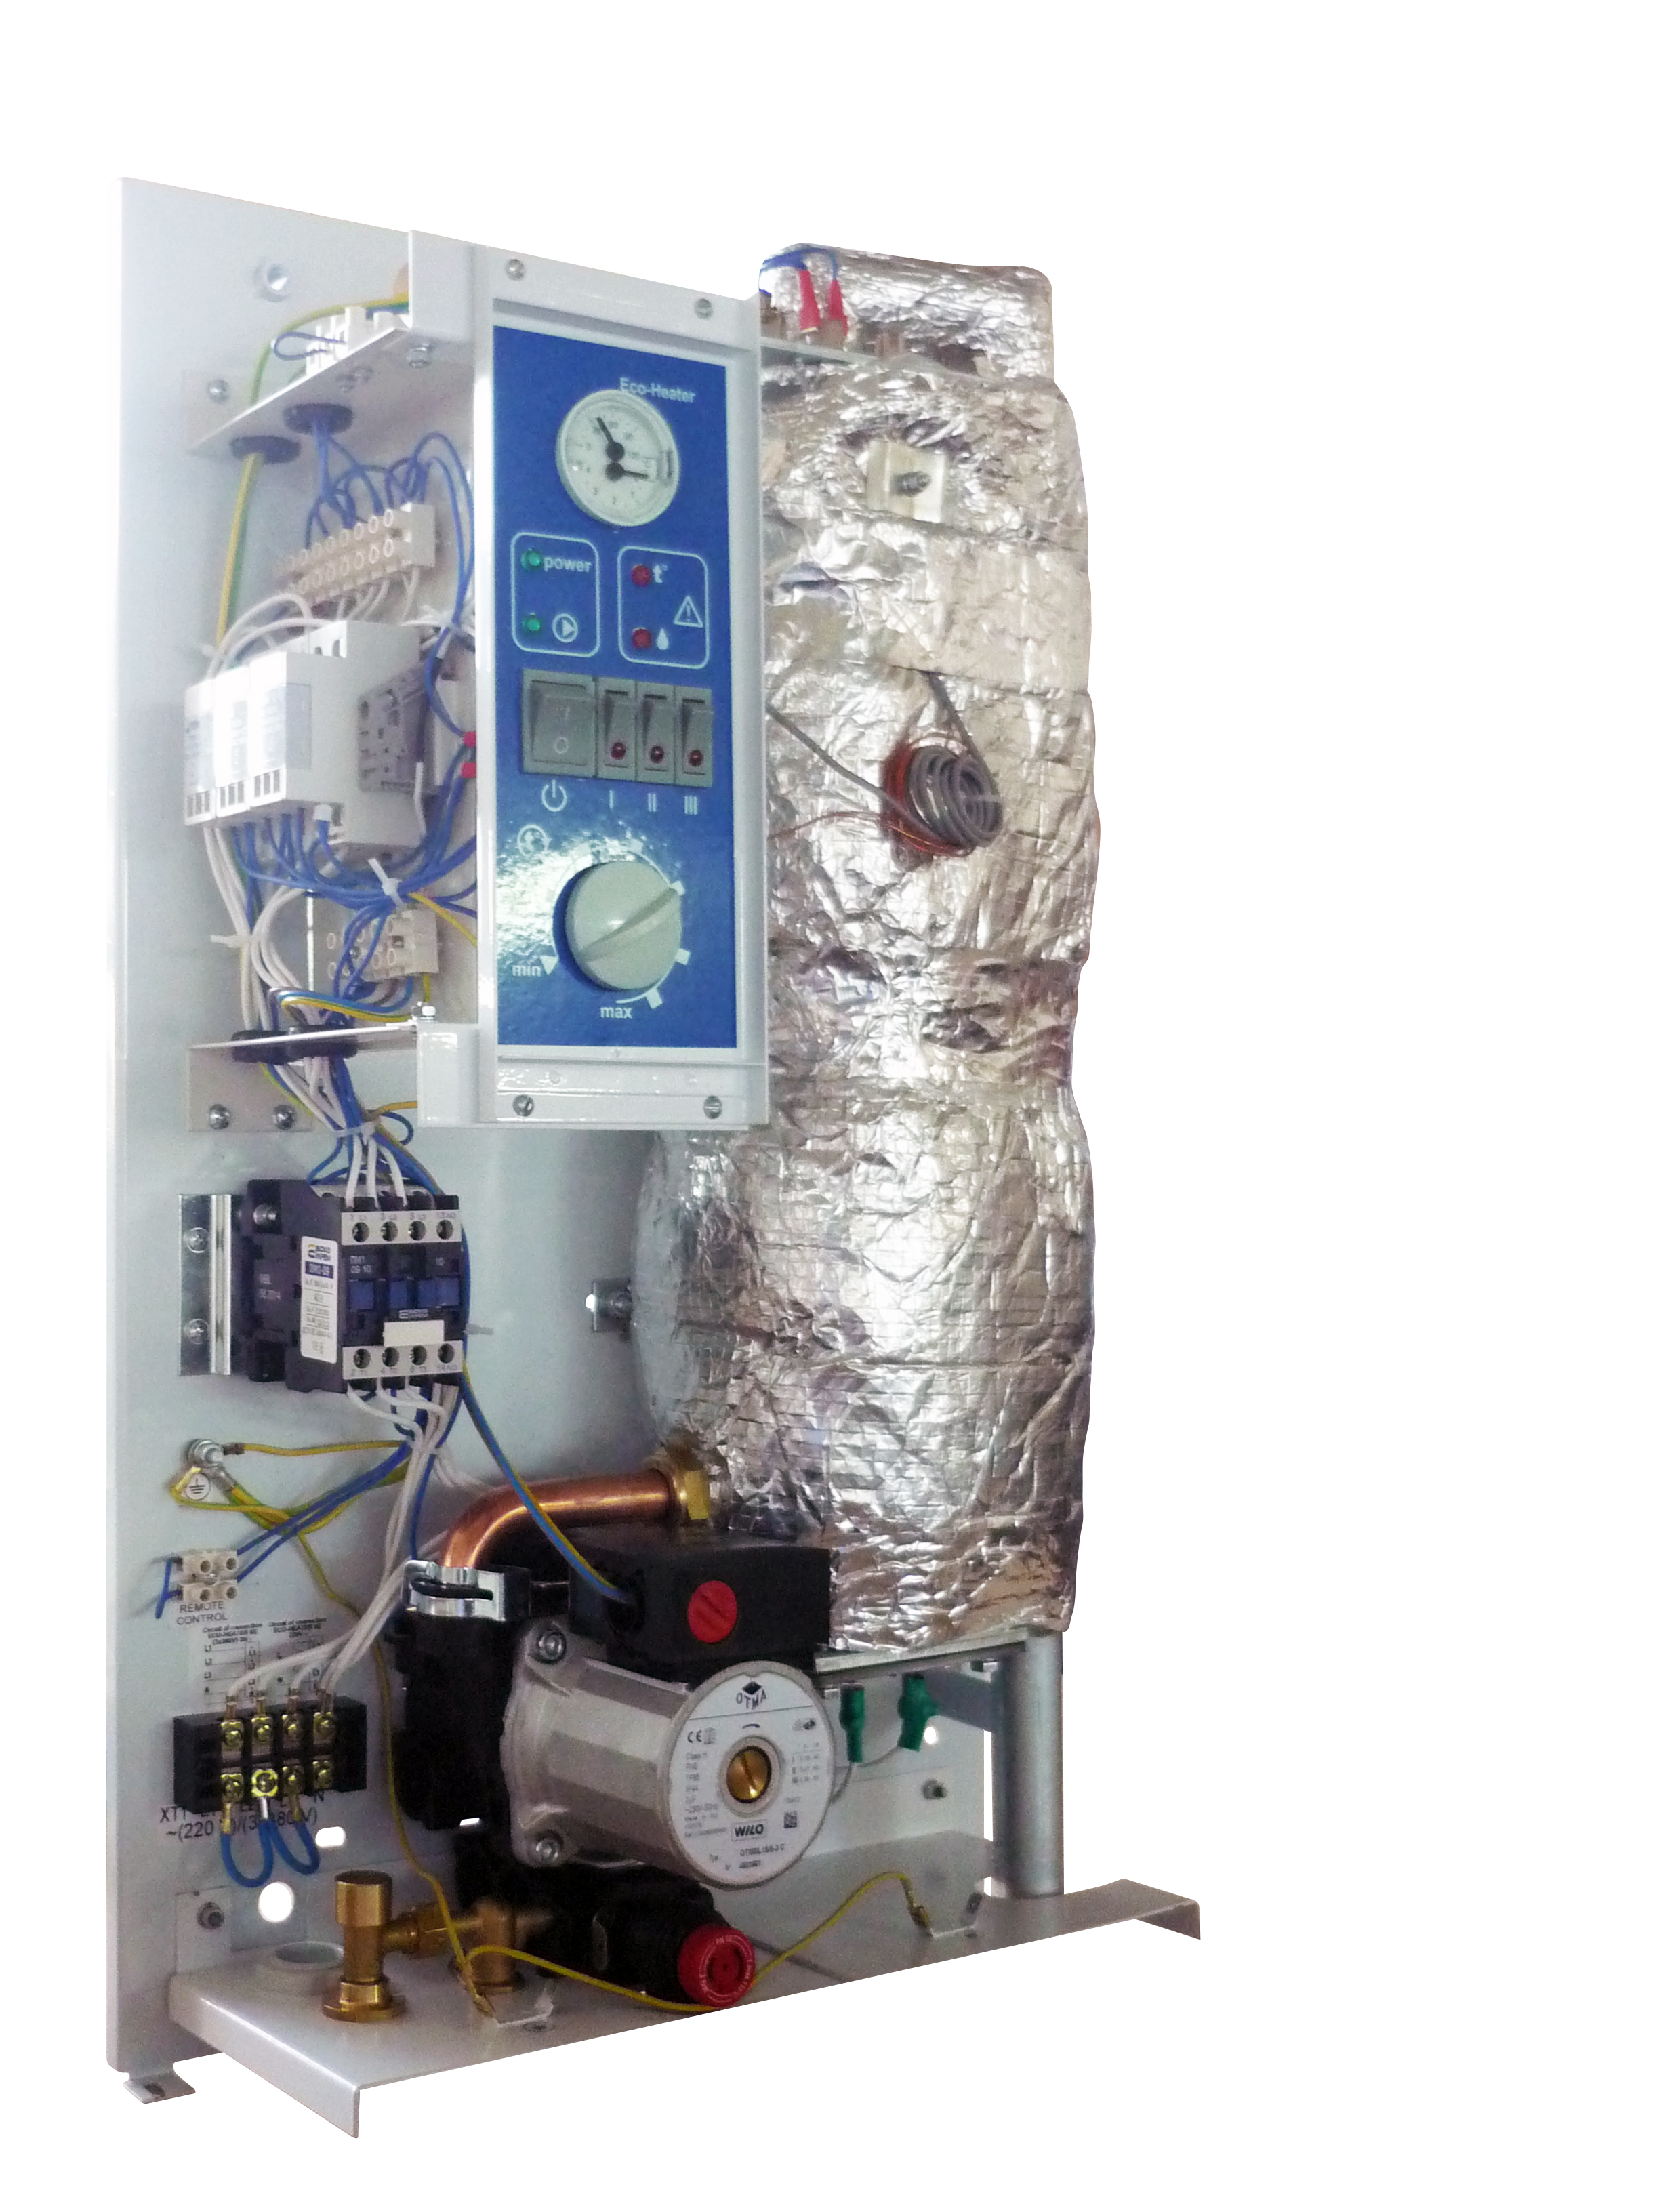 фото: Электрический котел Leberg - преимущества и критерии выбора